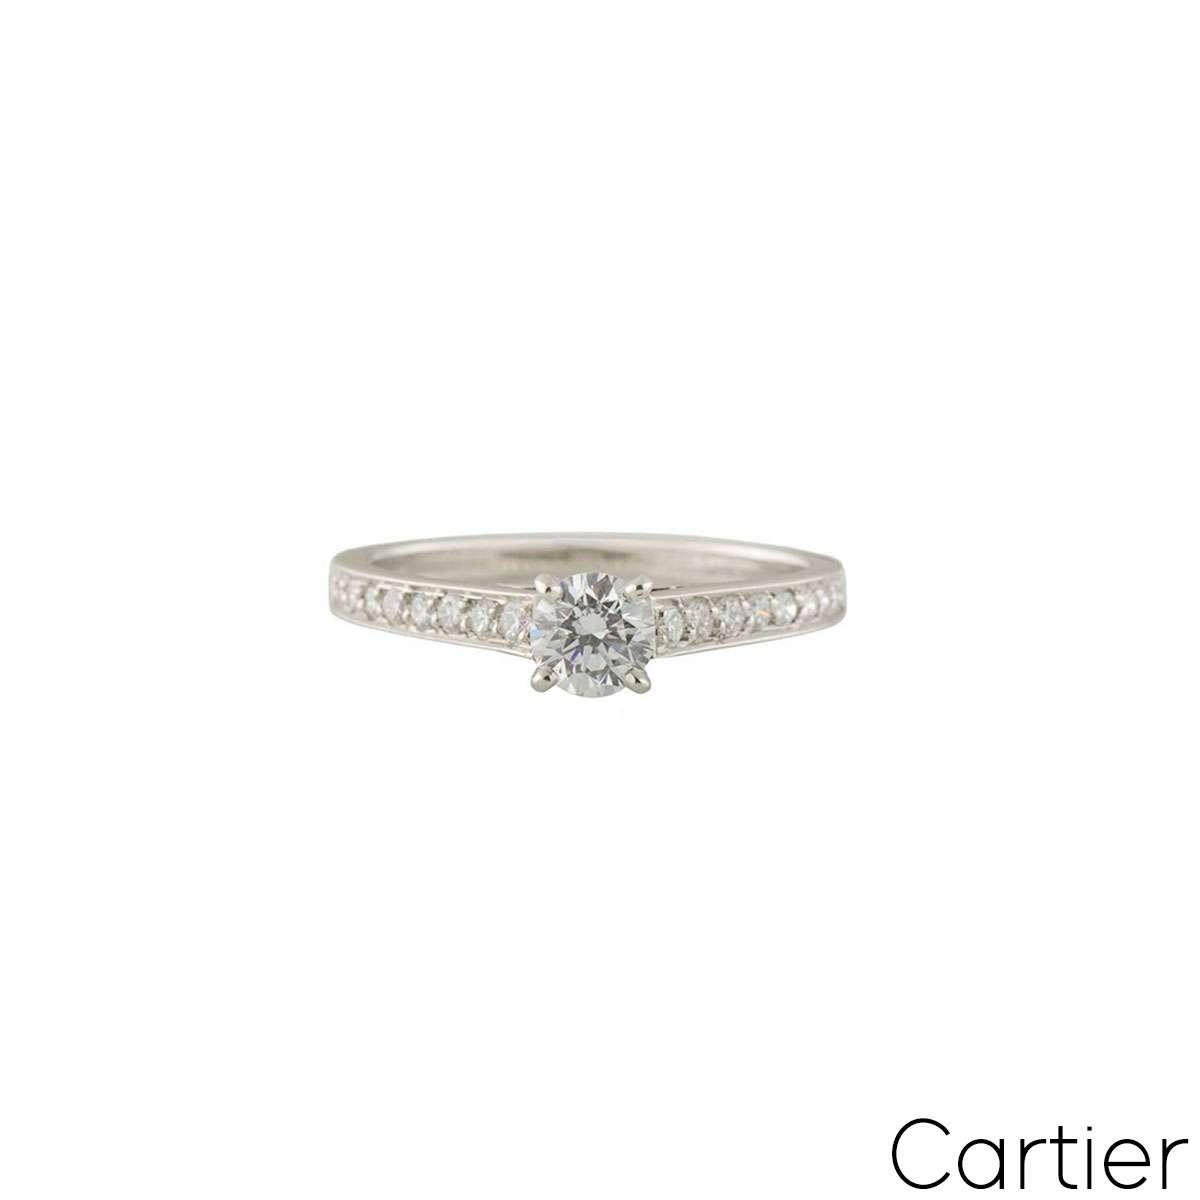 CartierPlatinum Diamond 1895 Solitaire Ring Size 47N4164647